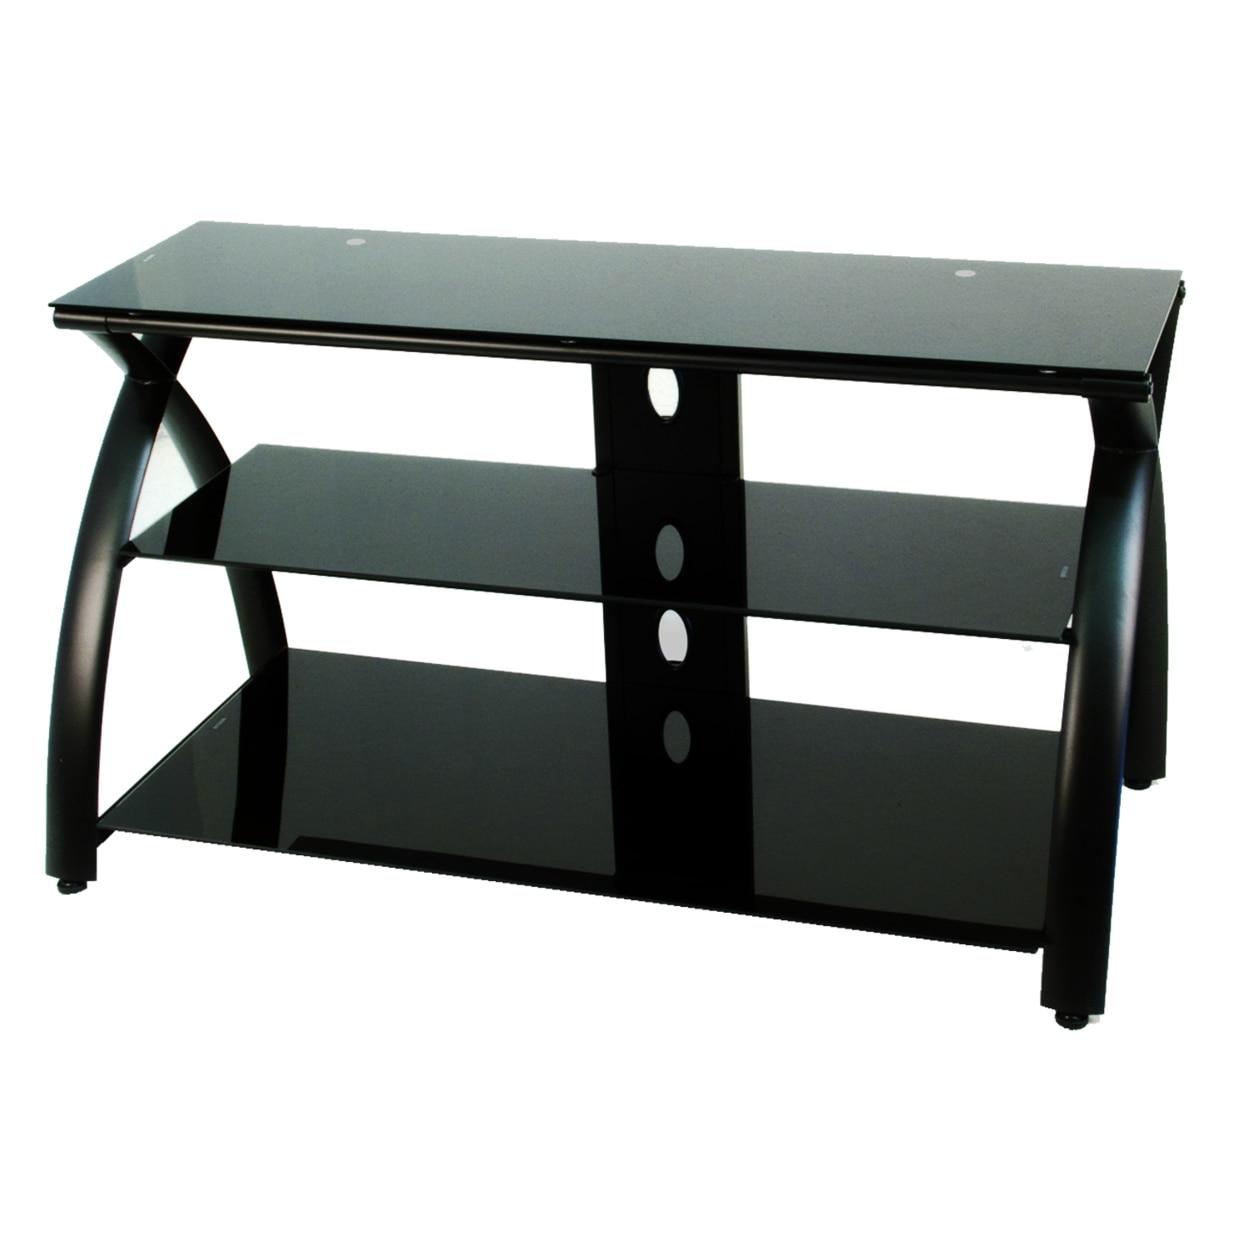 купить Offex Home Office Futura TV Stand Glass - Black/Black недорого